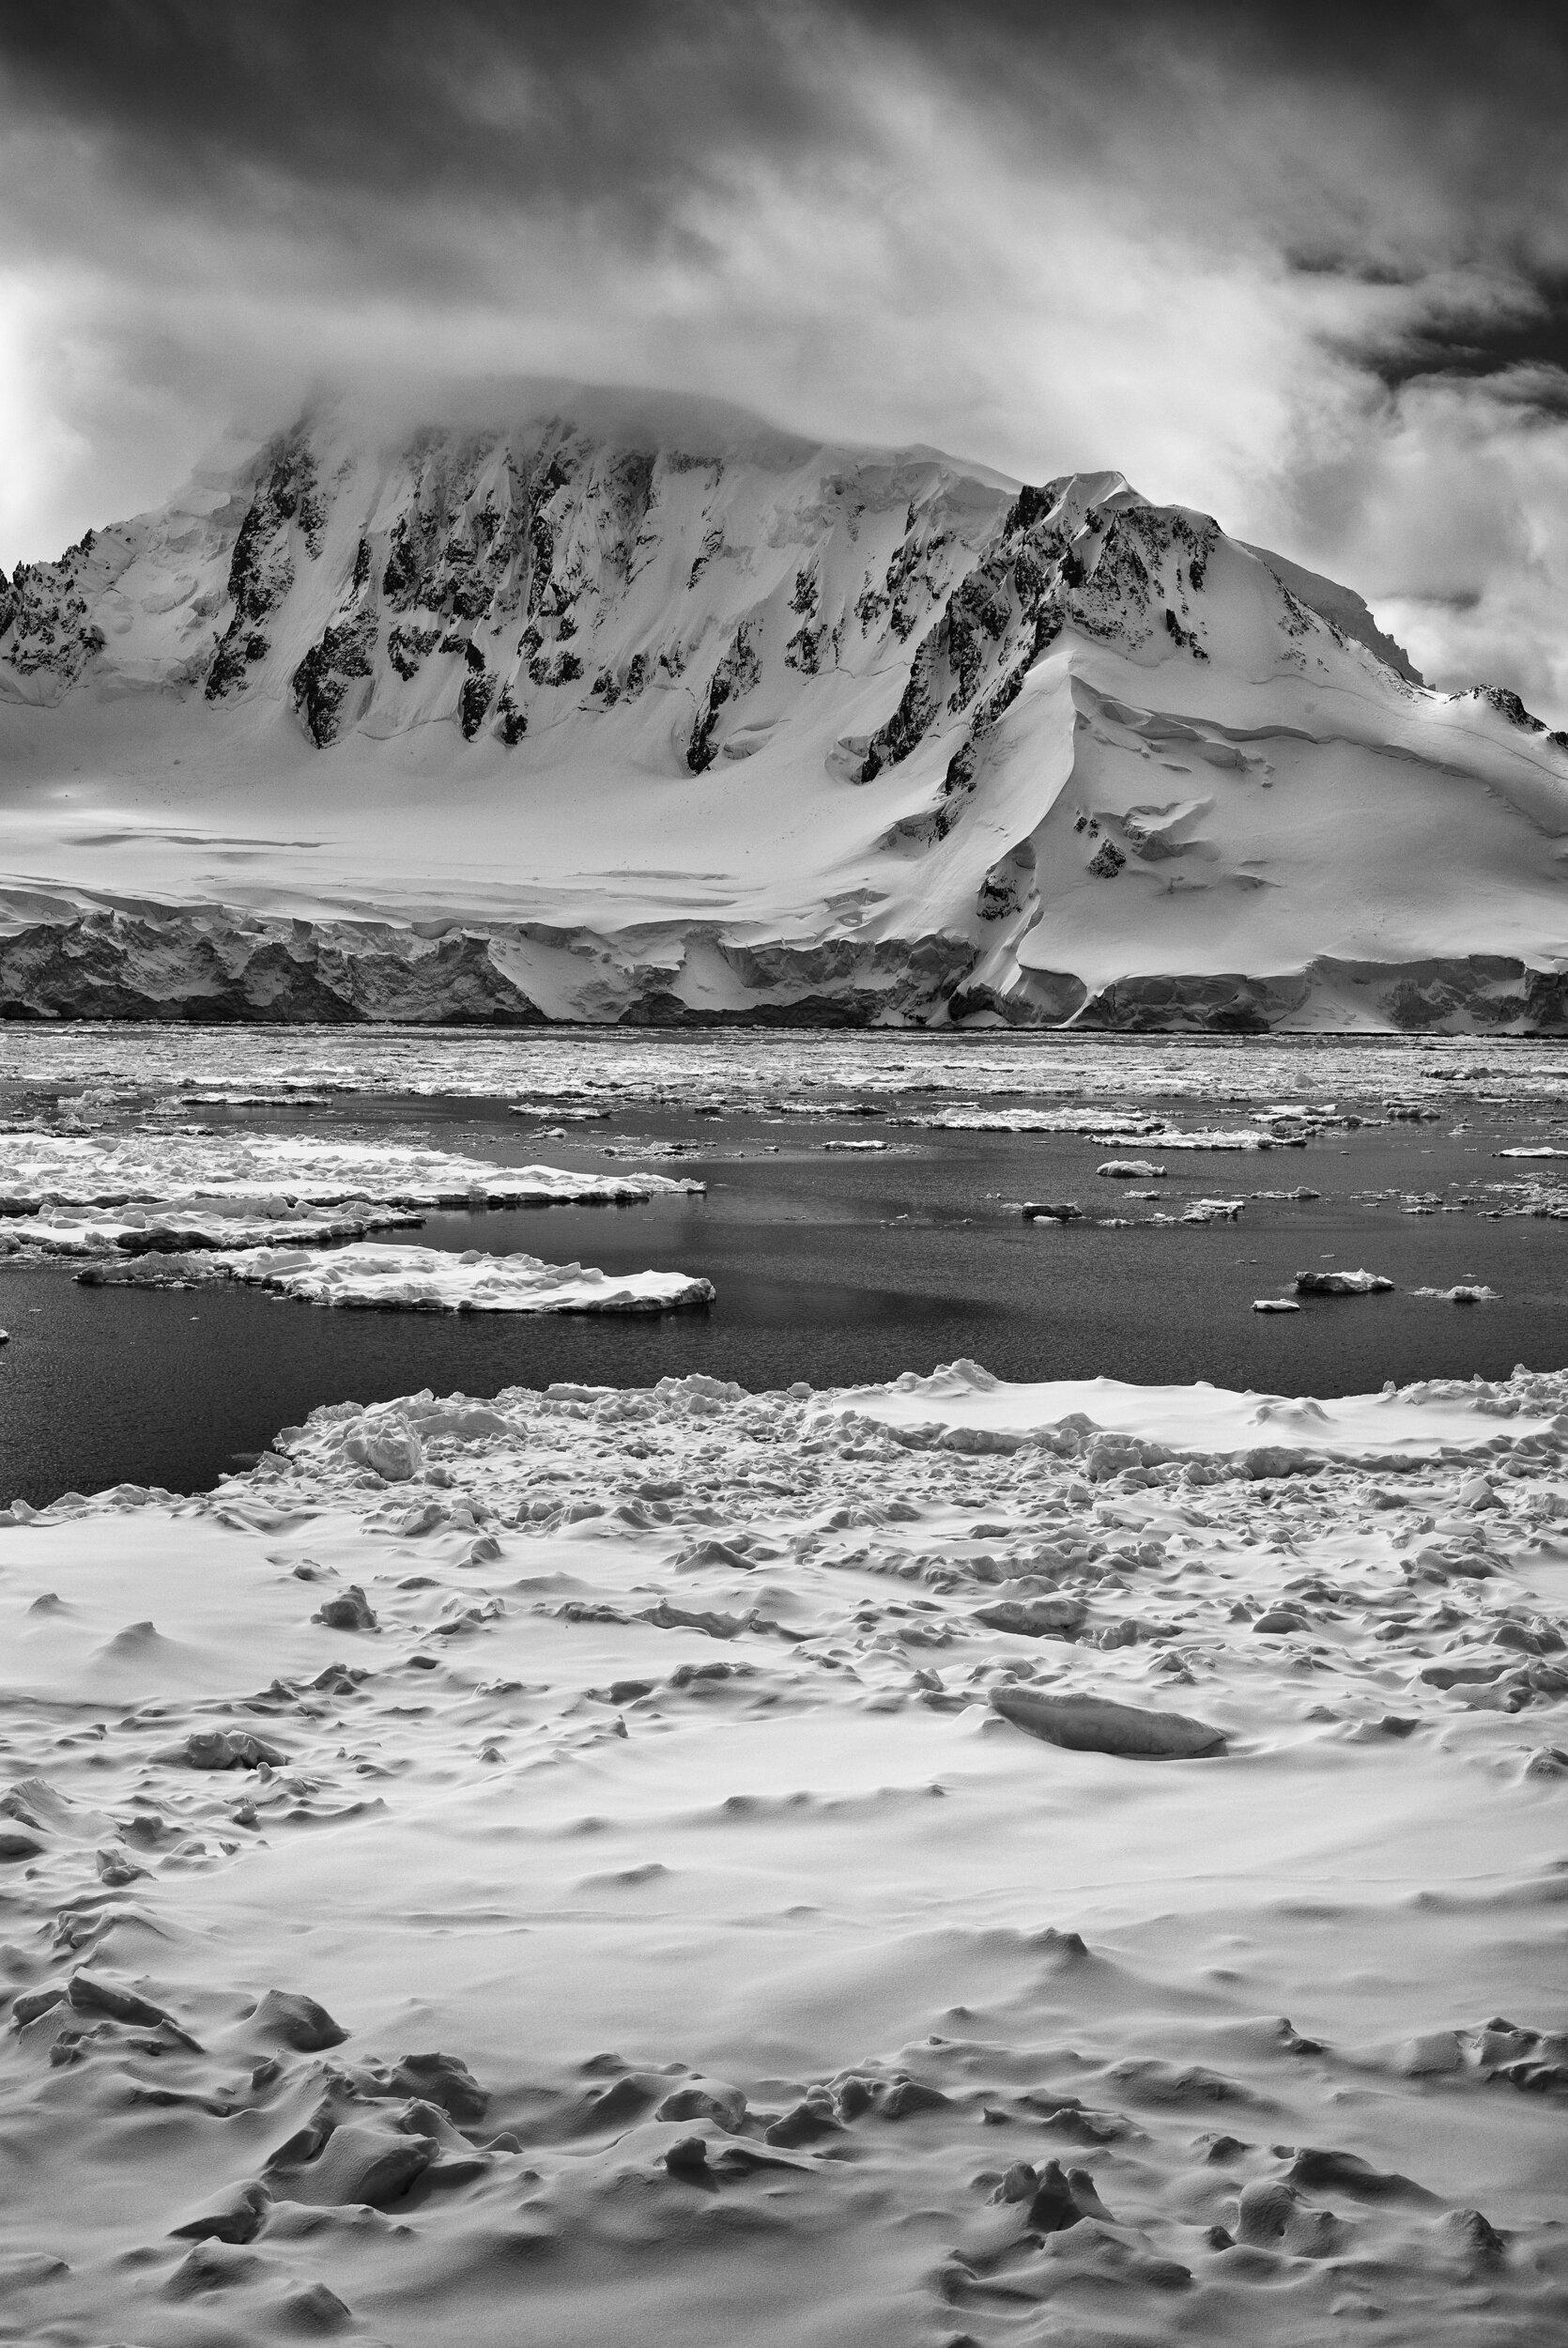 manuel_uebler_antarctica_bw_012.jpg